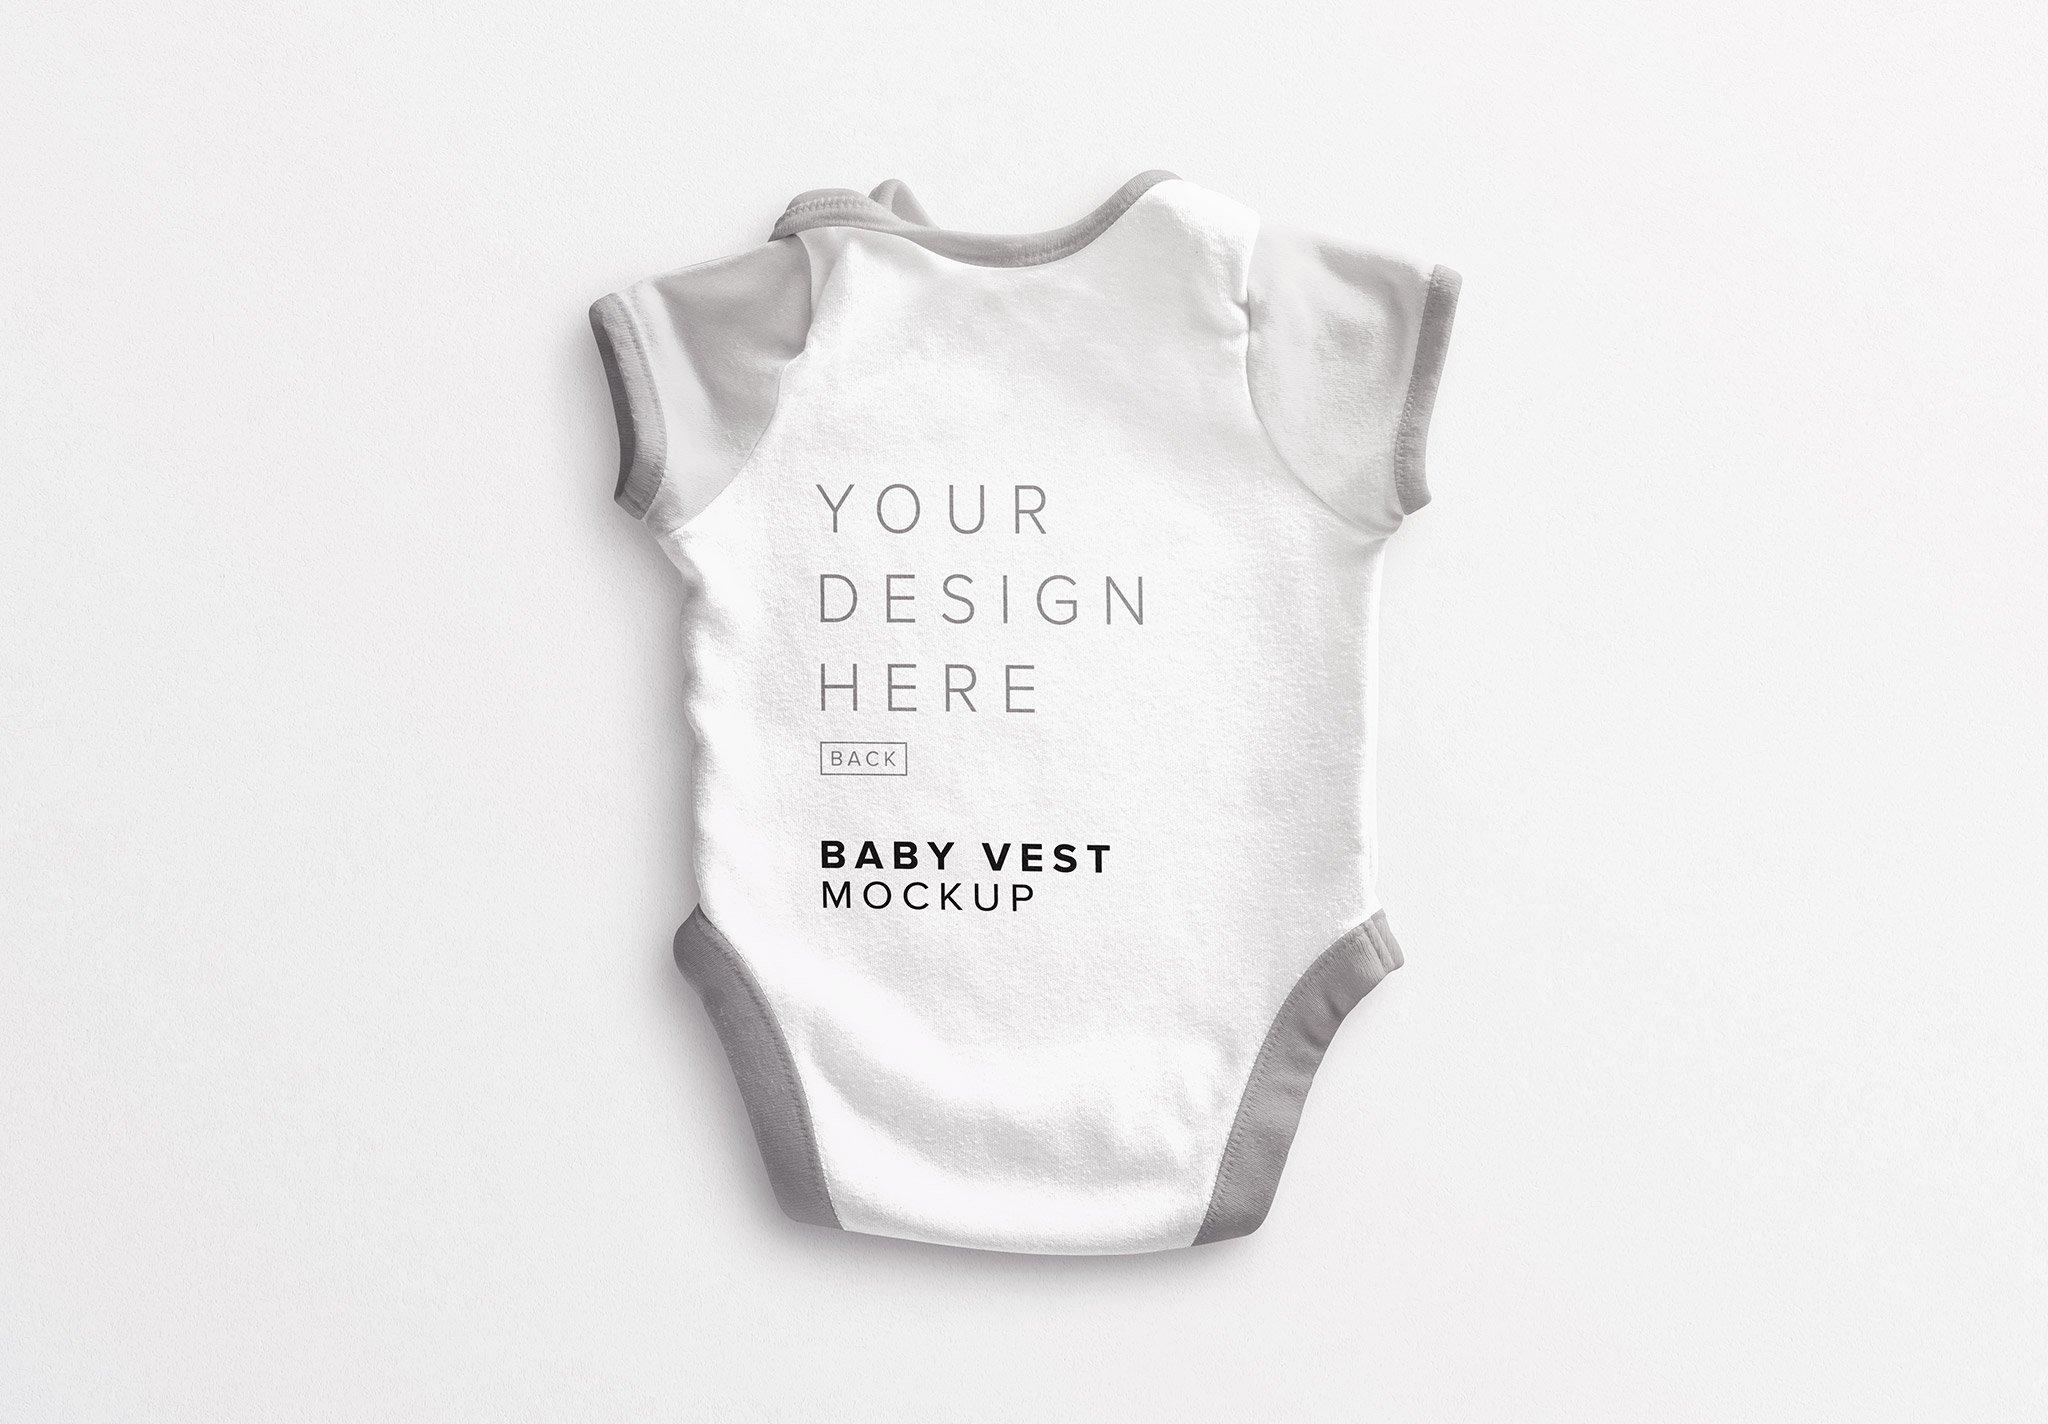 Baby Vest Back Mockup Thumbnail